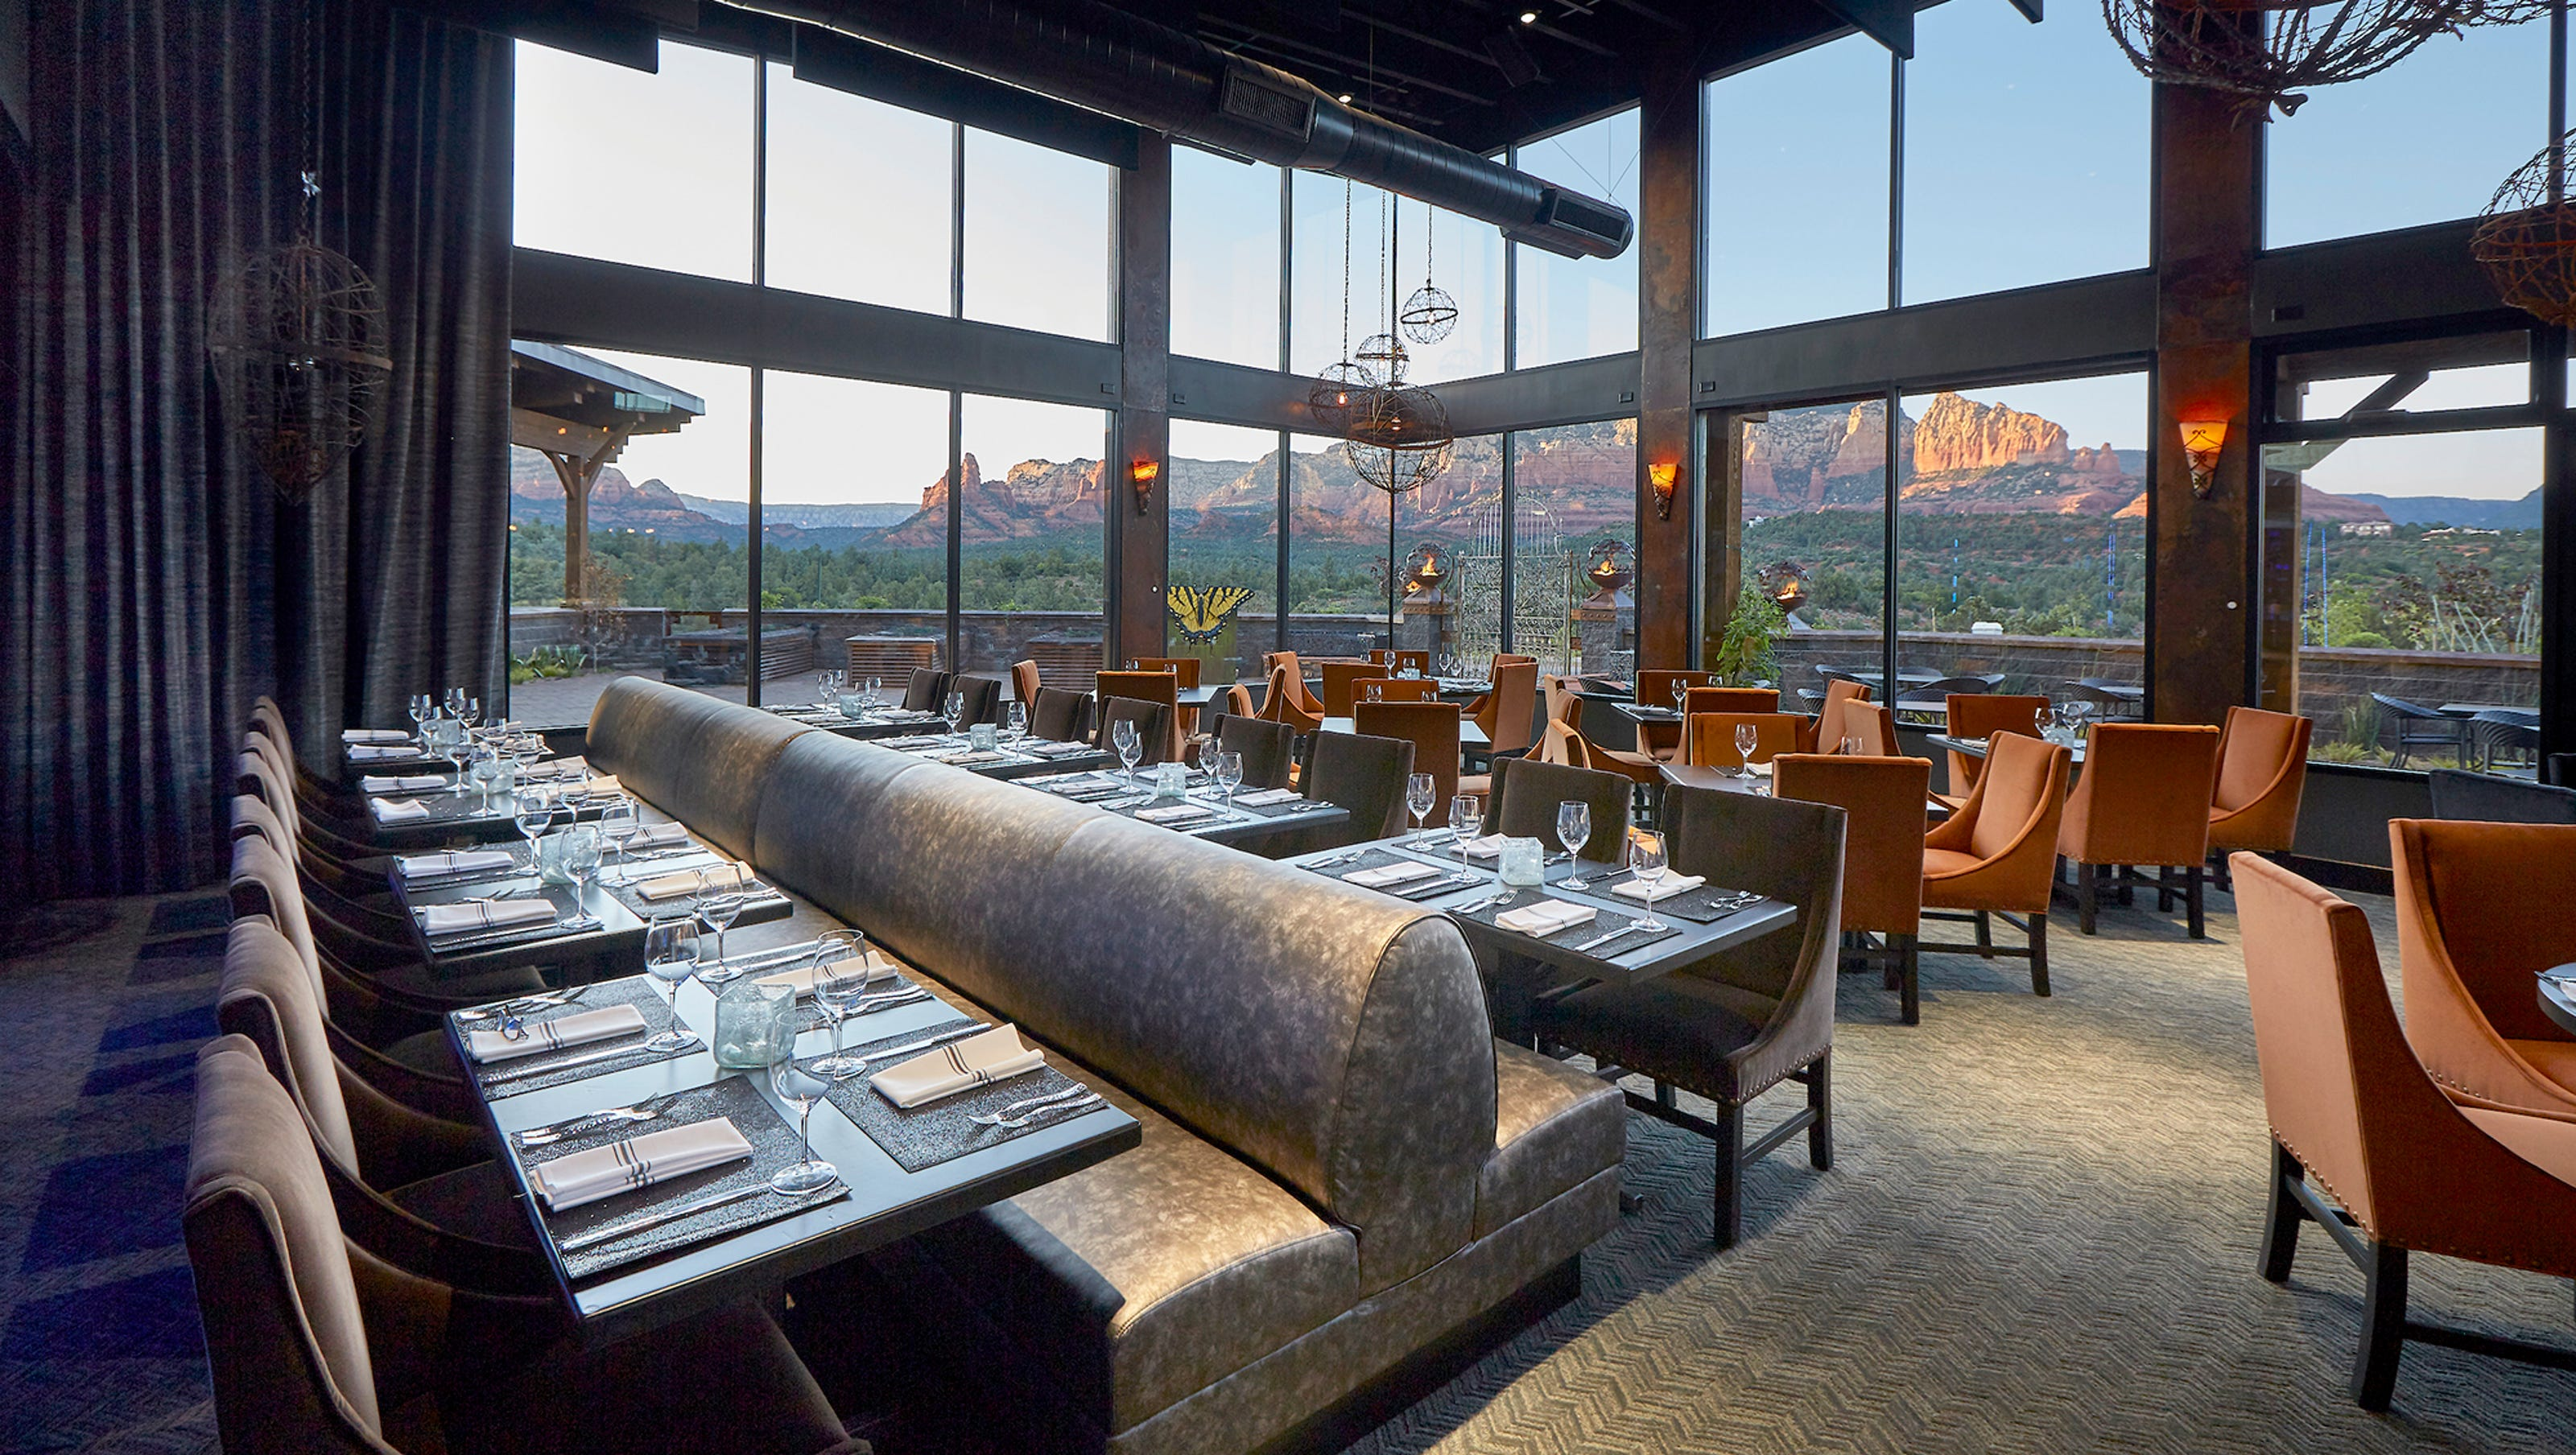 Dining Around Arizona 9 Great Spots In Sedona